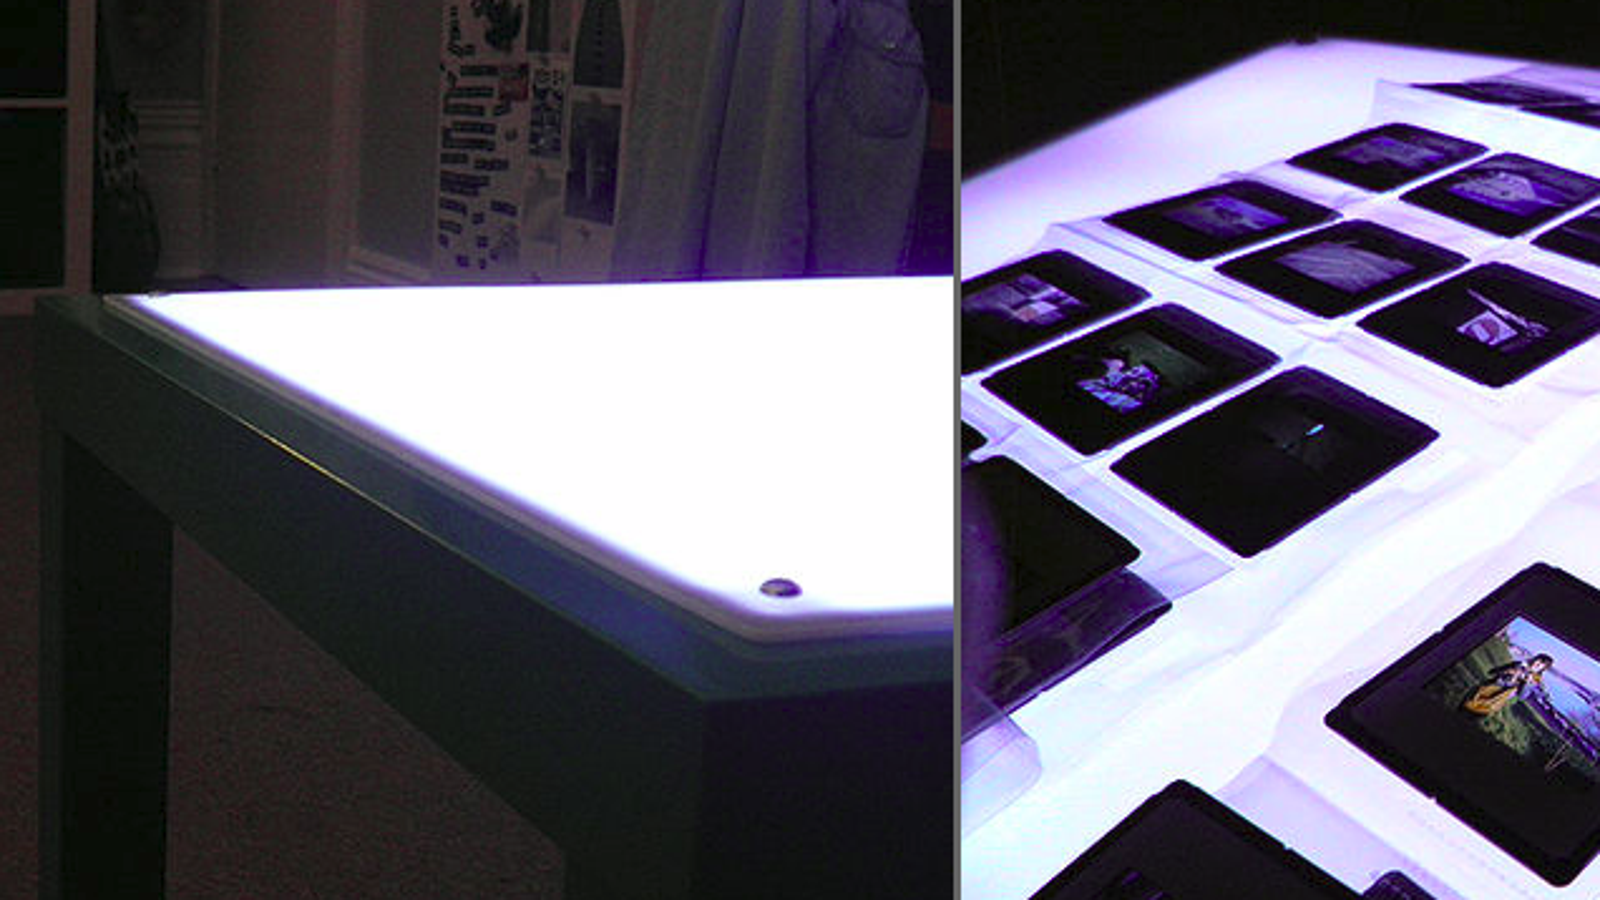 Turn An Ikea Lack Table Into A Light Box